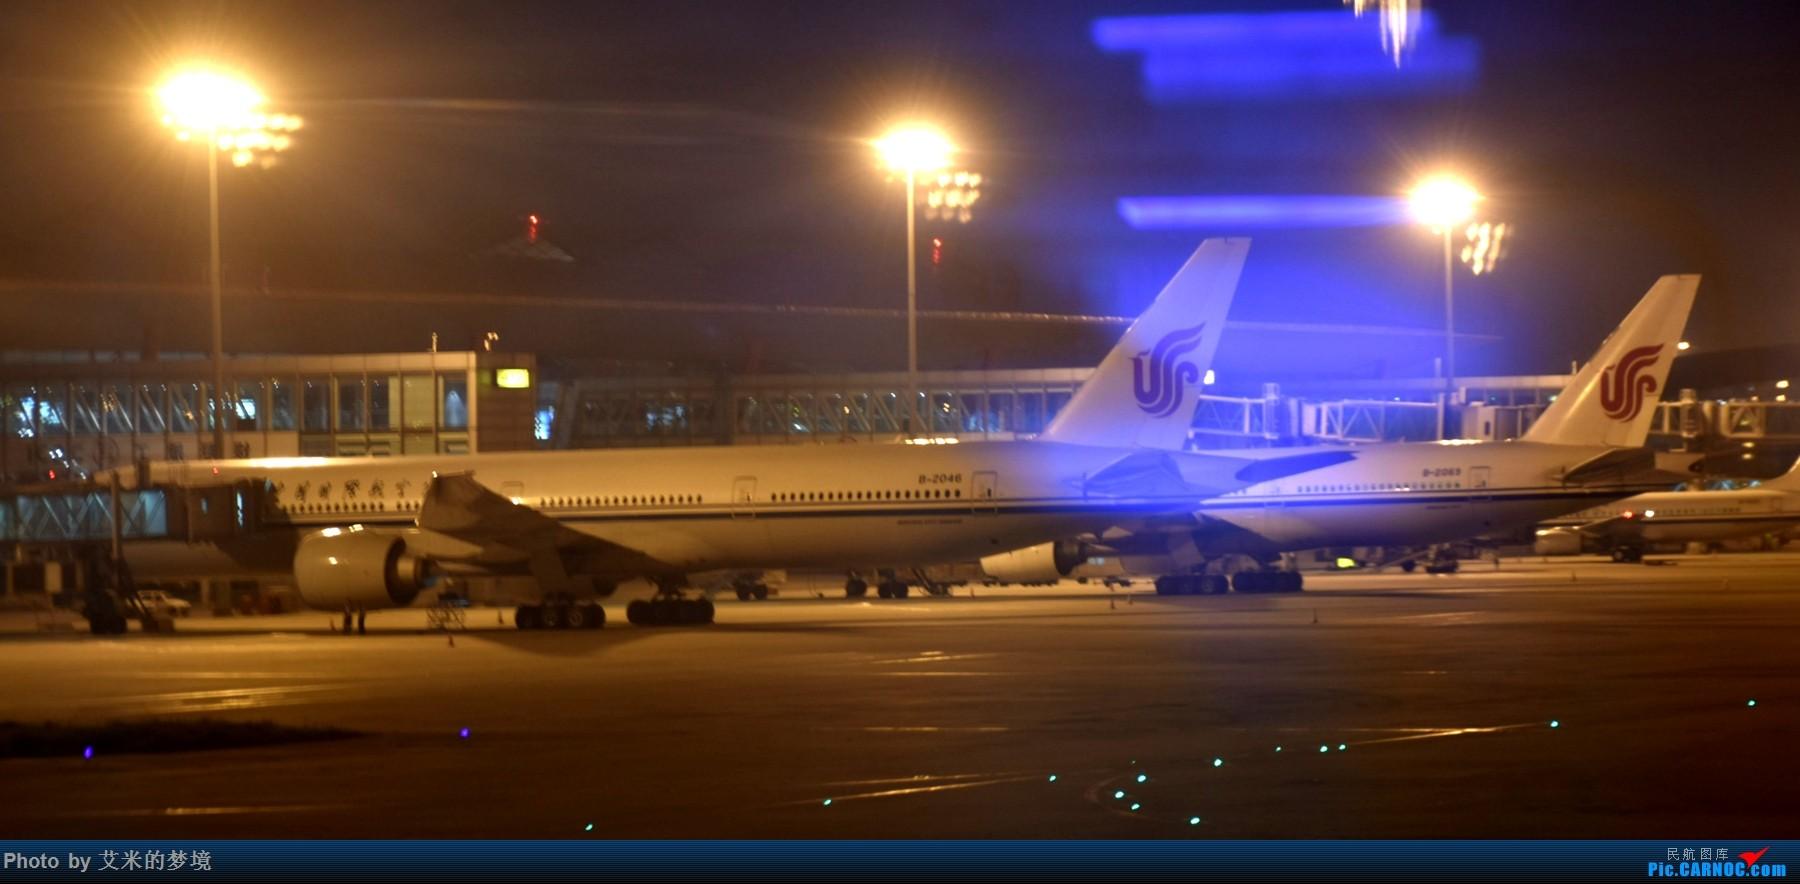 Re:[原创]【carnoc重庆飞友会】北京送行,所见飞行 BOEING 777-300ER B-2046 中国北京首都国际机场